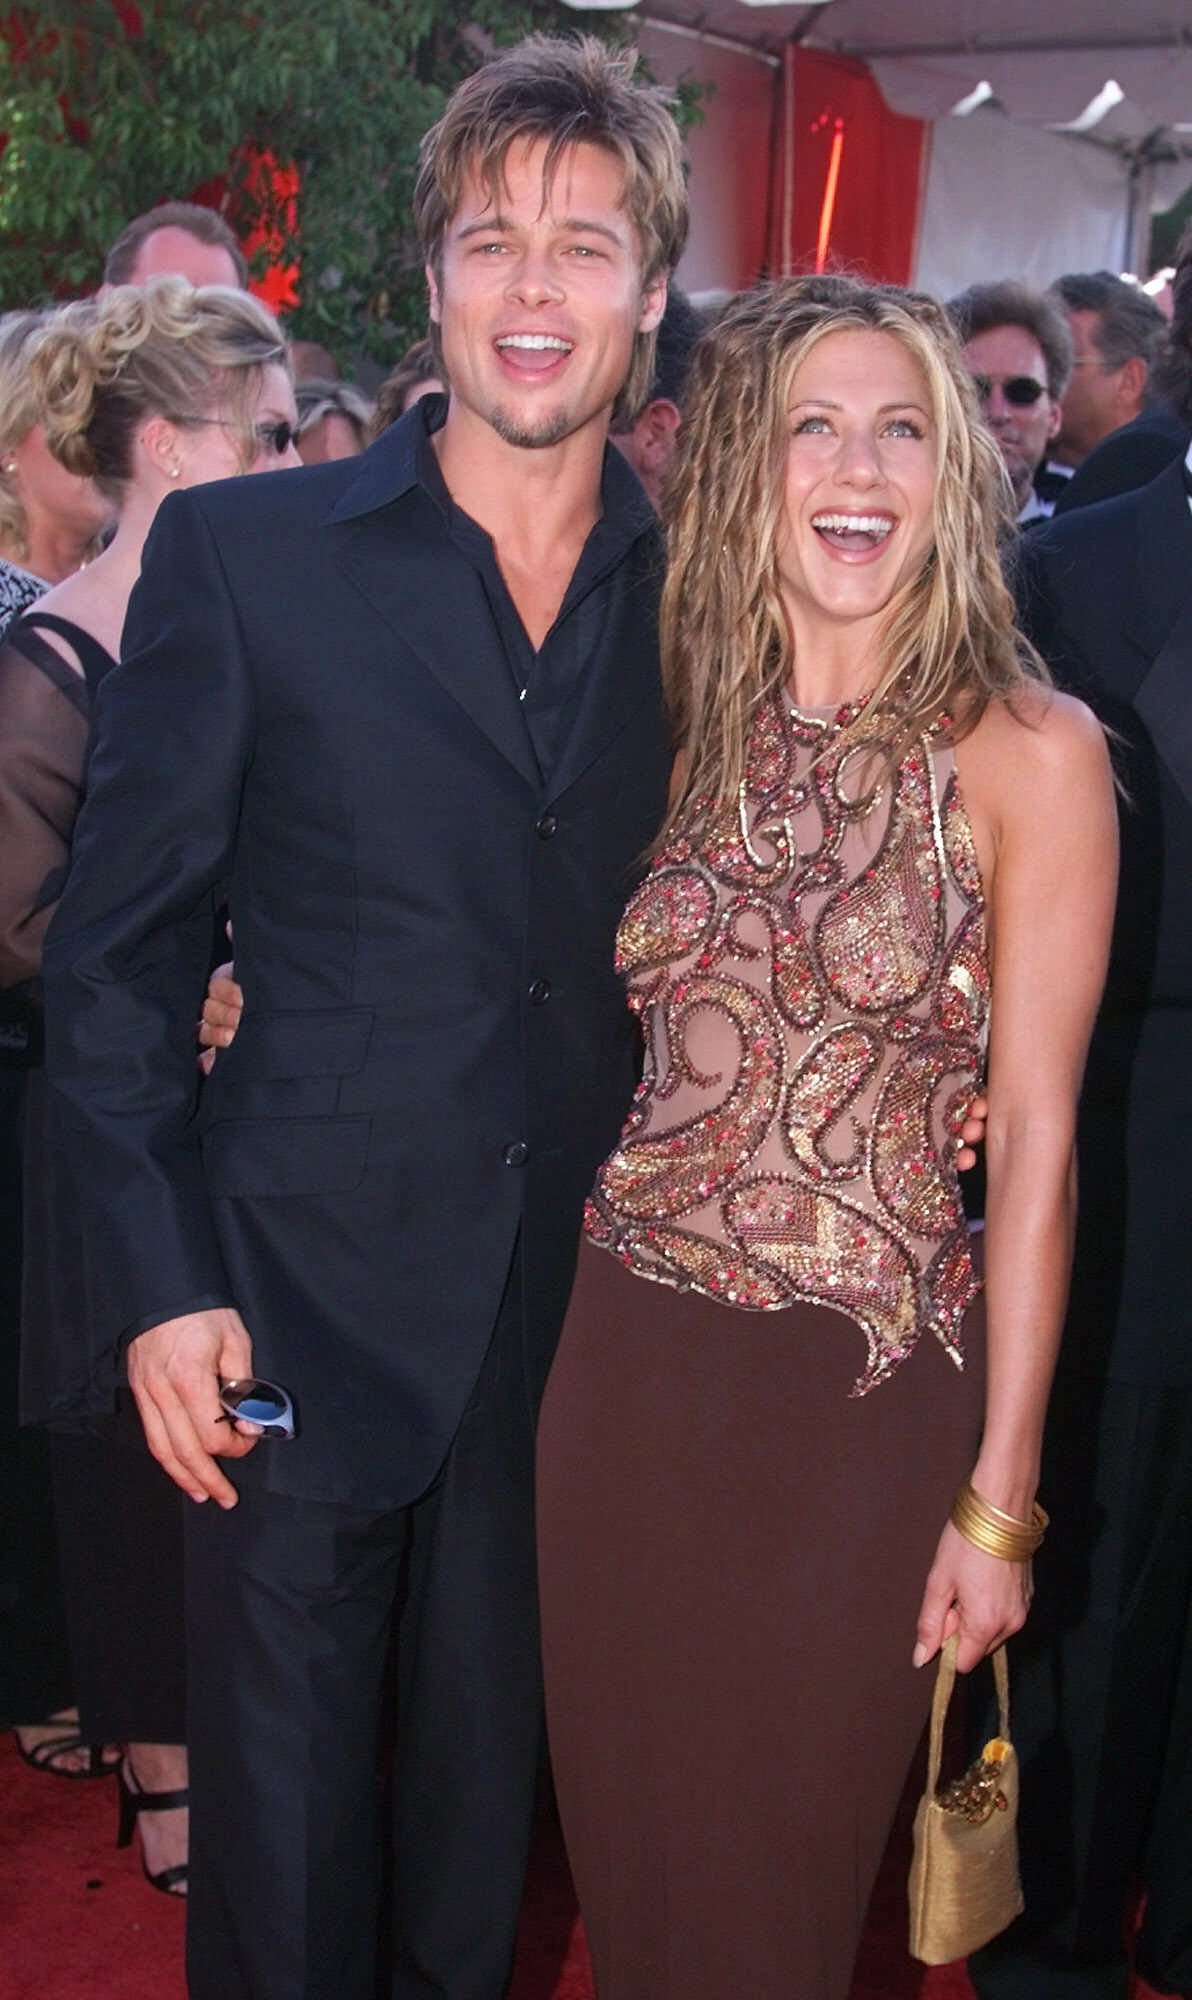 Brad Pitt and Jennifer Aniston arrive for the 51st Annual Primetime Emmy Awards at the Shrine Auditorium in Los Angeles on Sept. 12, 1999.